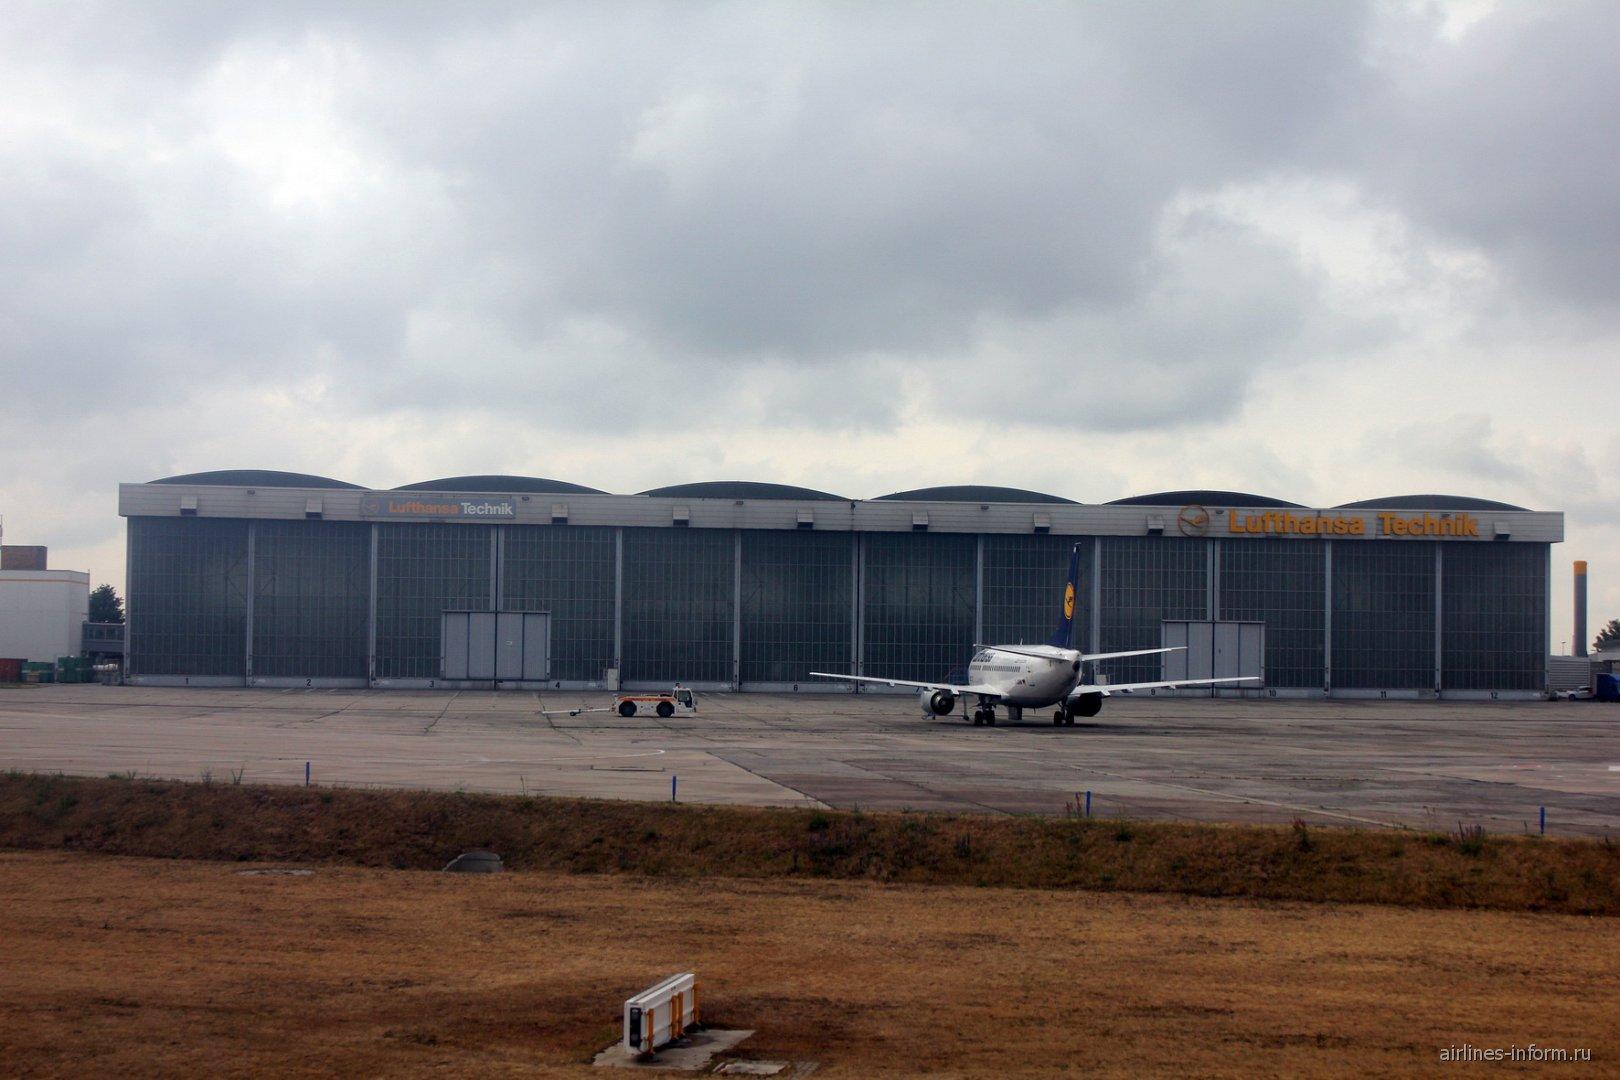 Ангар для техобслуживания самолетов Lufthansa в аэропорту Берлин Бранденбург